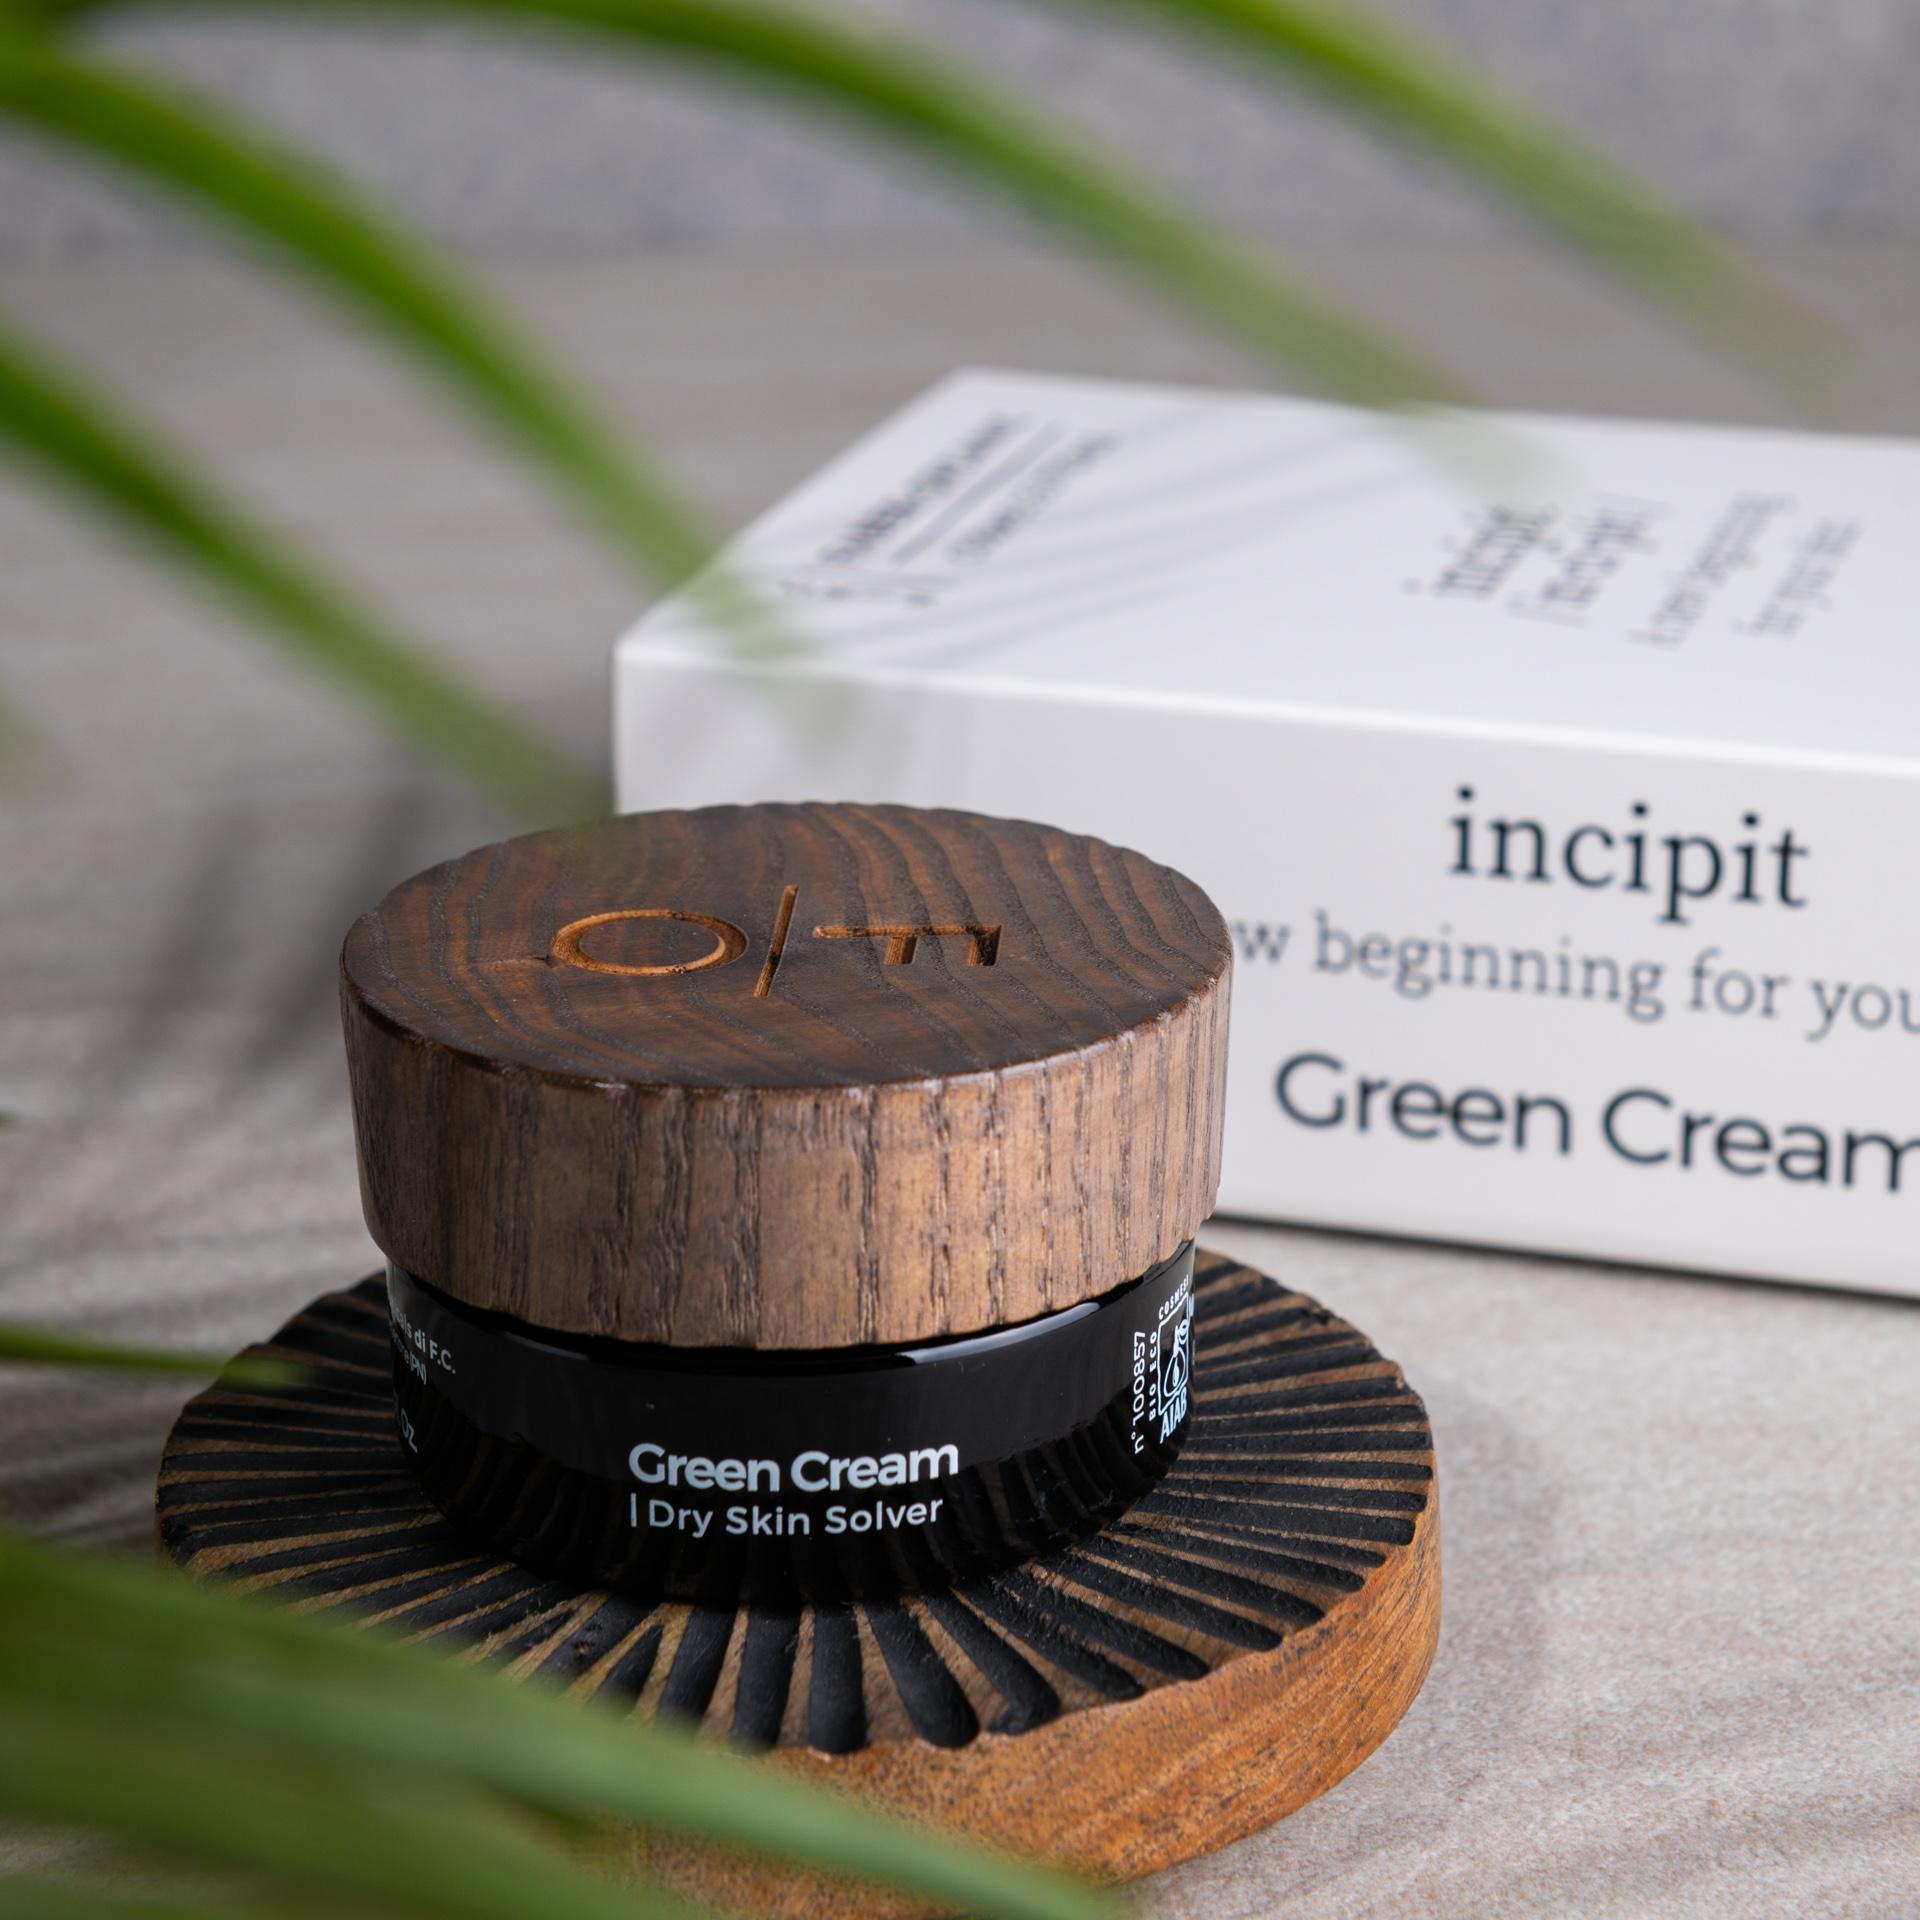 Green Cream - Dry Skin Solver